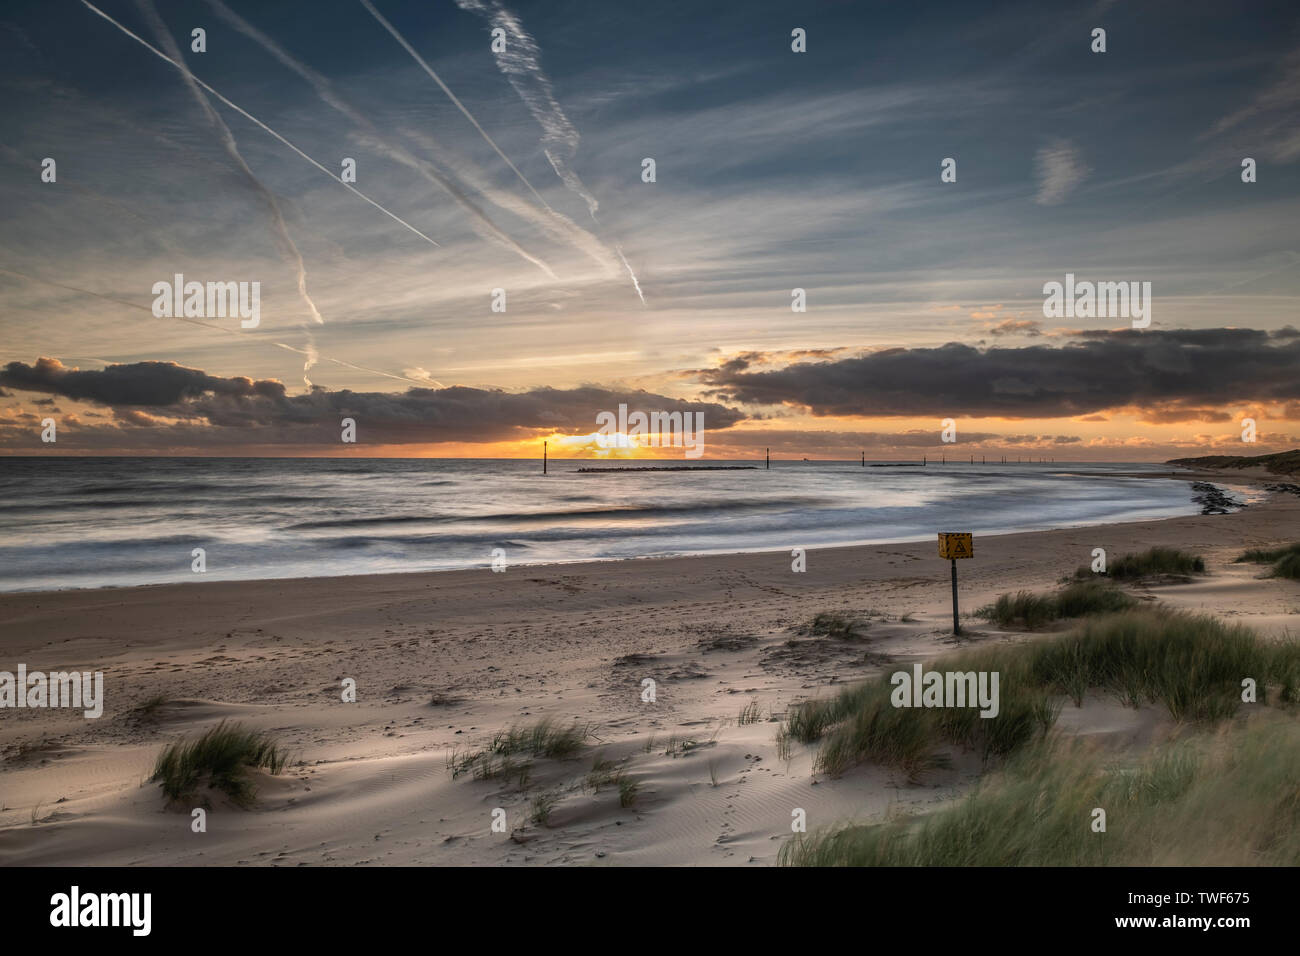 Morning sunrise at Sea Palling in Norfolk. - Stock Image